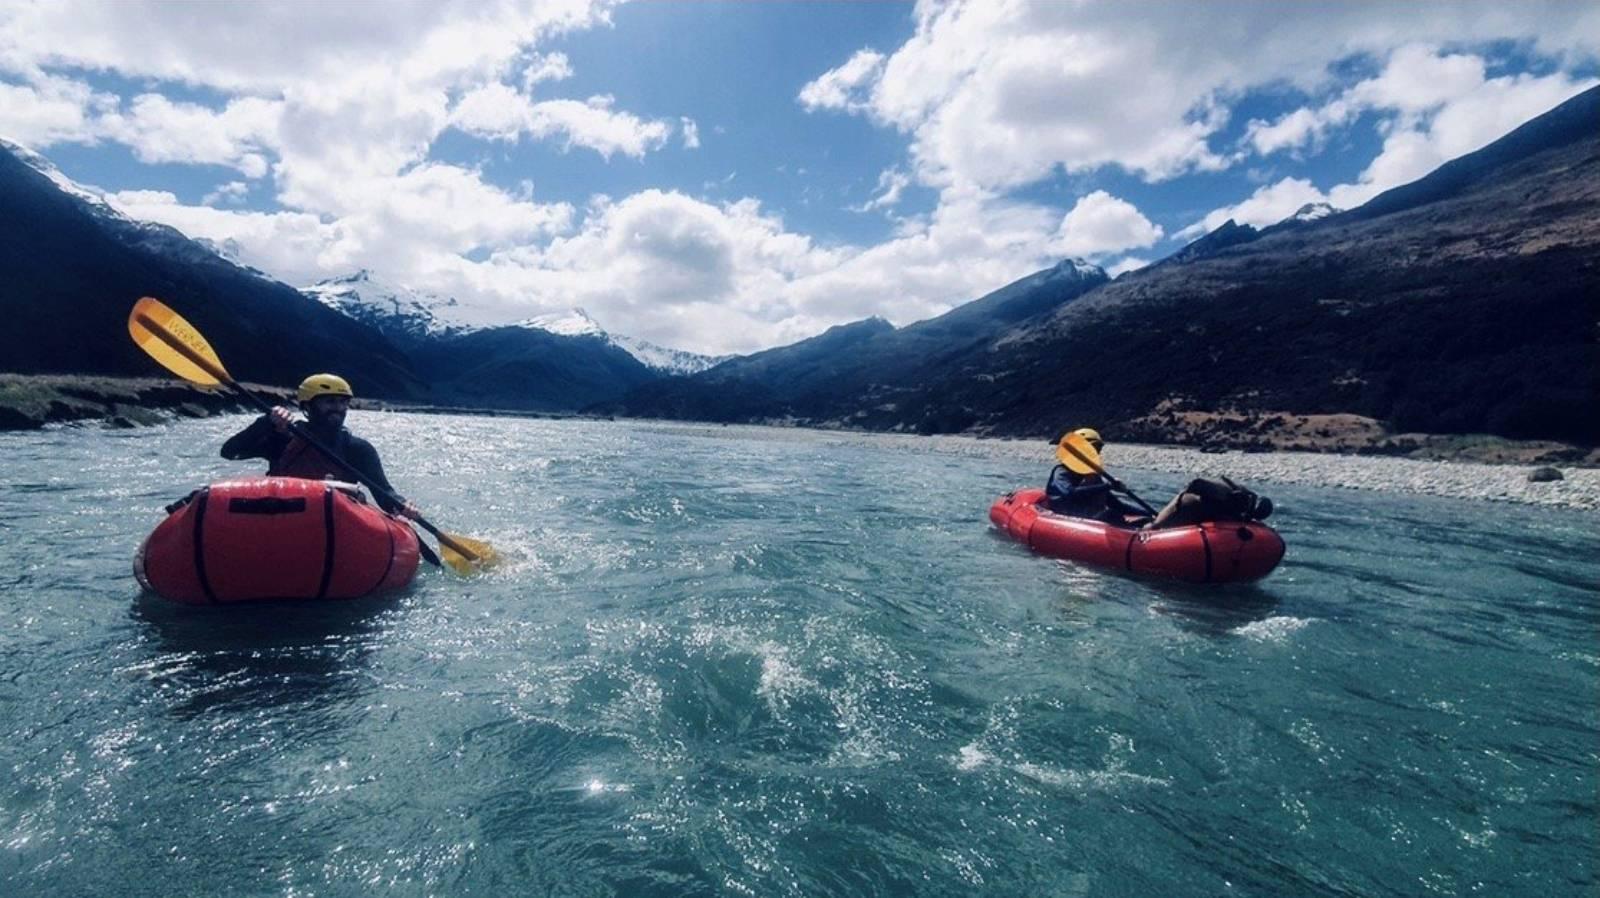 Packrafting: NZ's next adventure sport?